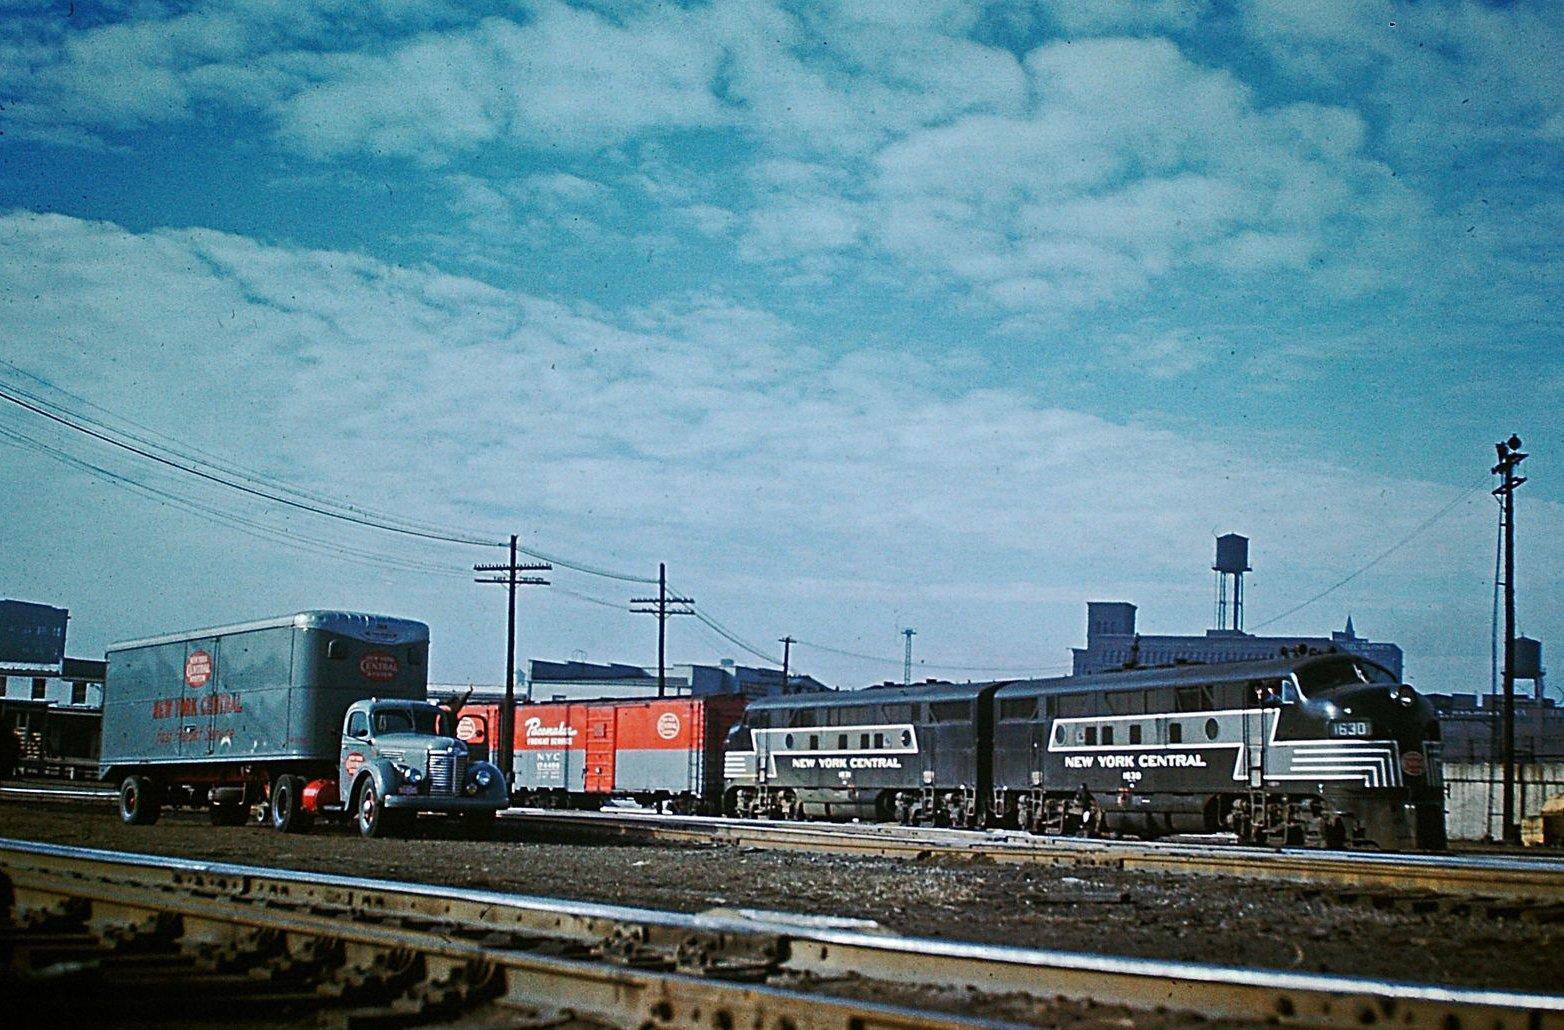 Vice Versa Nyc >> New York Central Railroad: Map, Photos, History & More